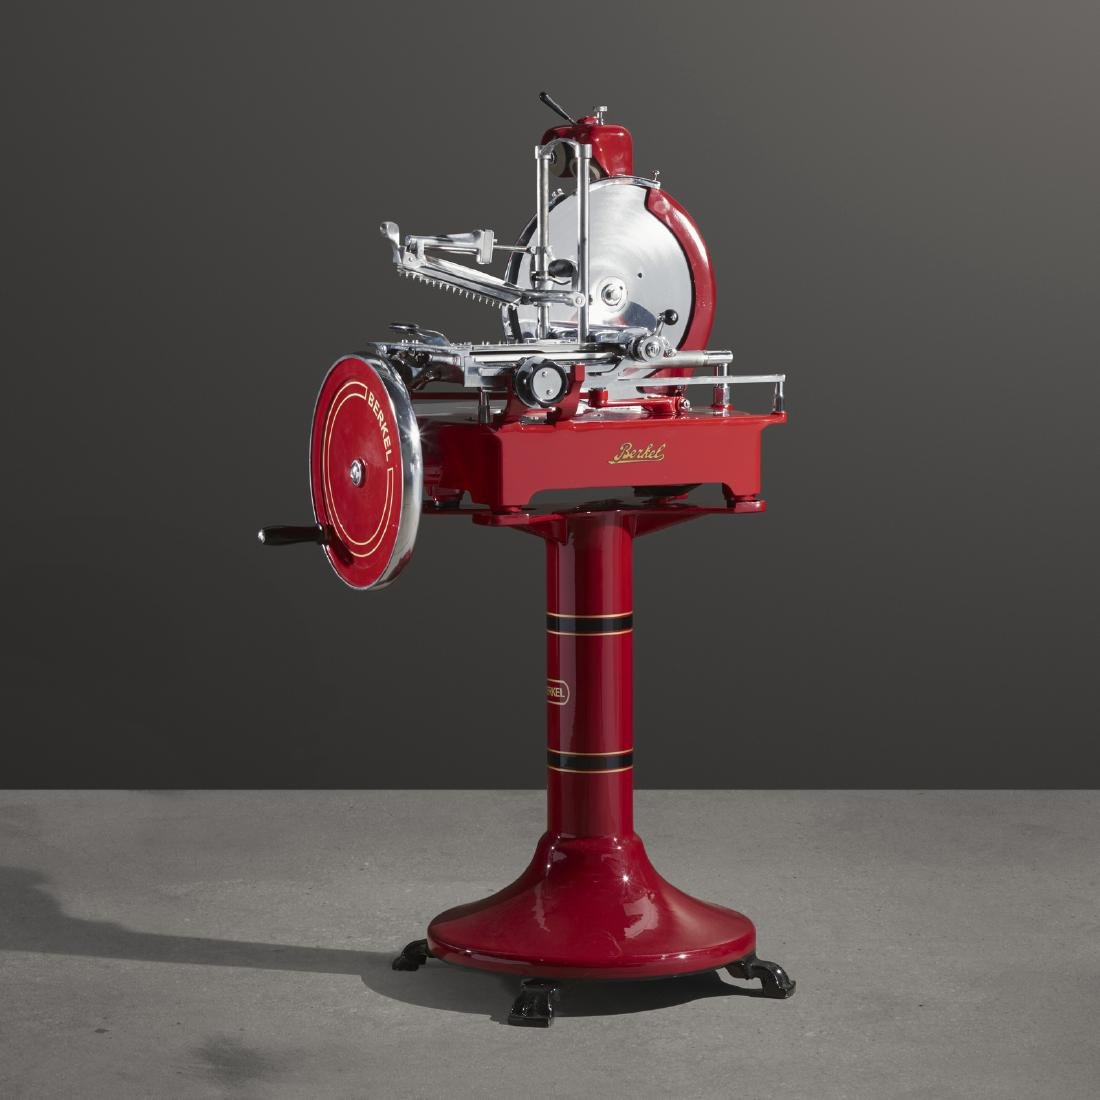 Berkel, Flywheel slicer, model 12